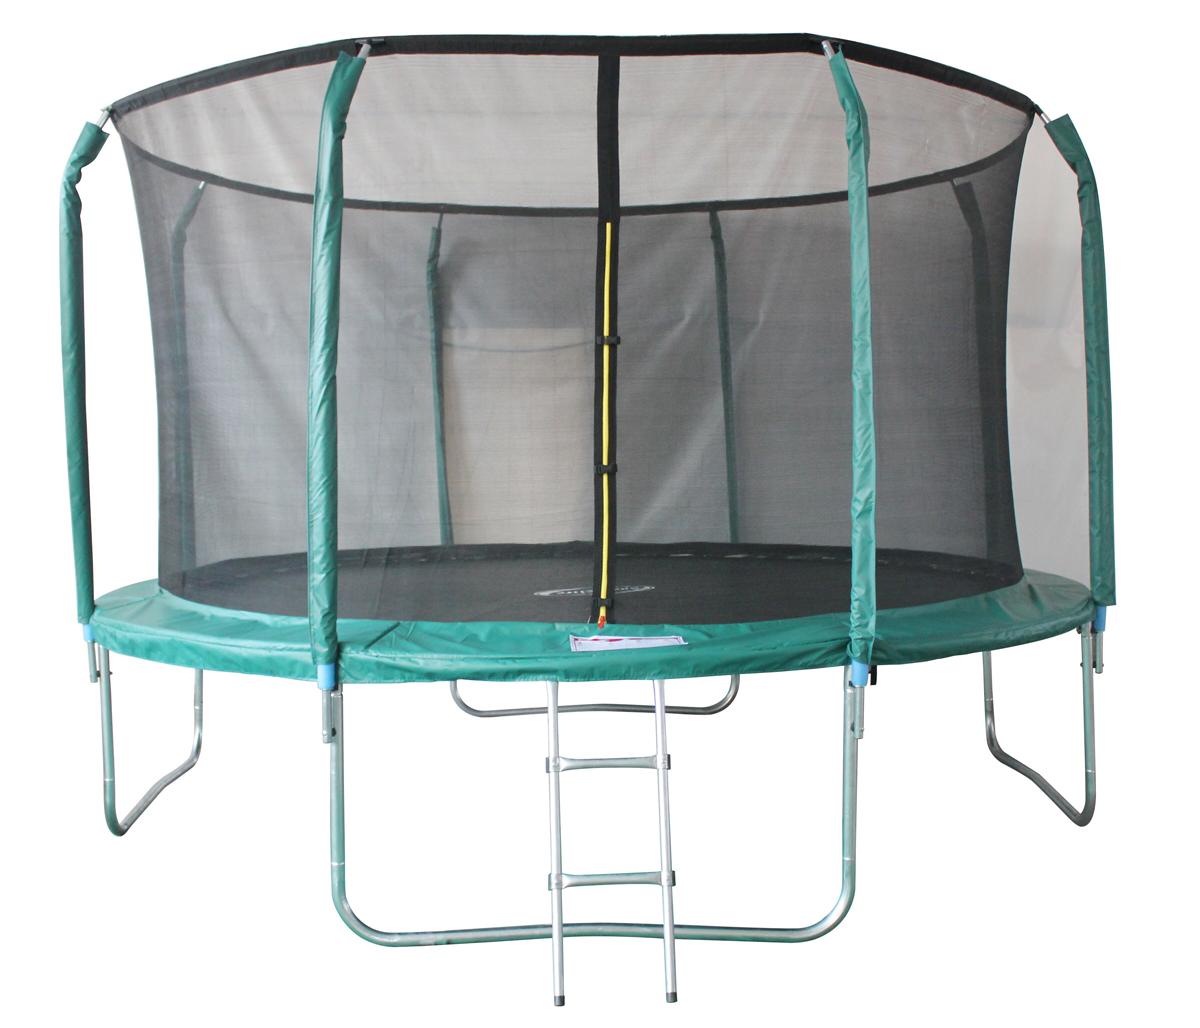 Батут Sport Elit, с лестницей и защитной сеткой, диаметр 366 см. GB10211-12FT цена